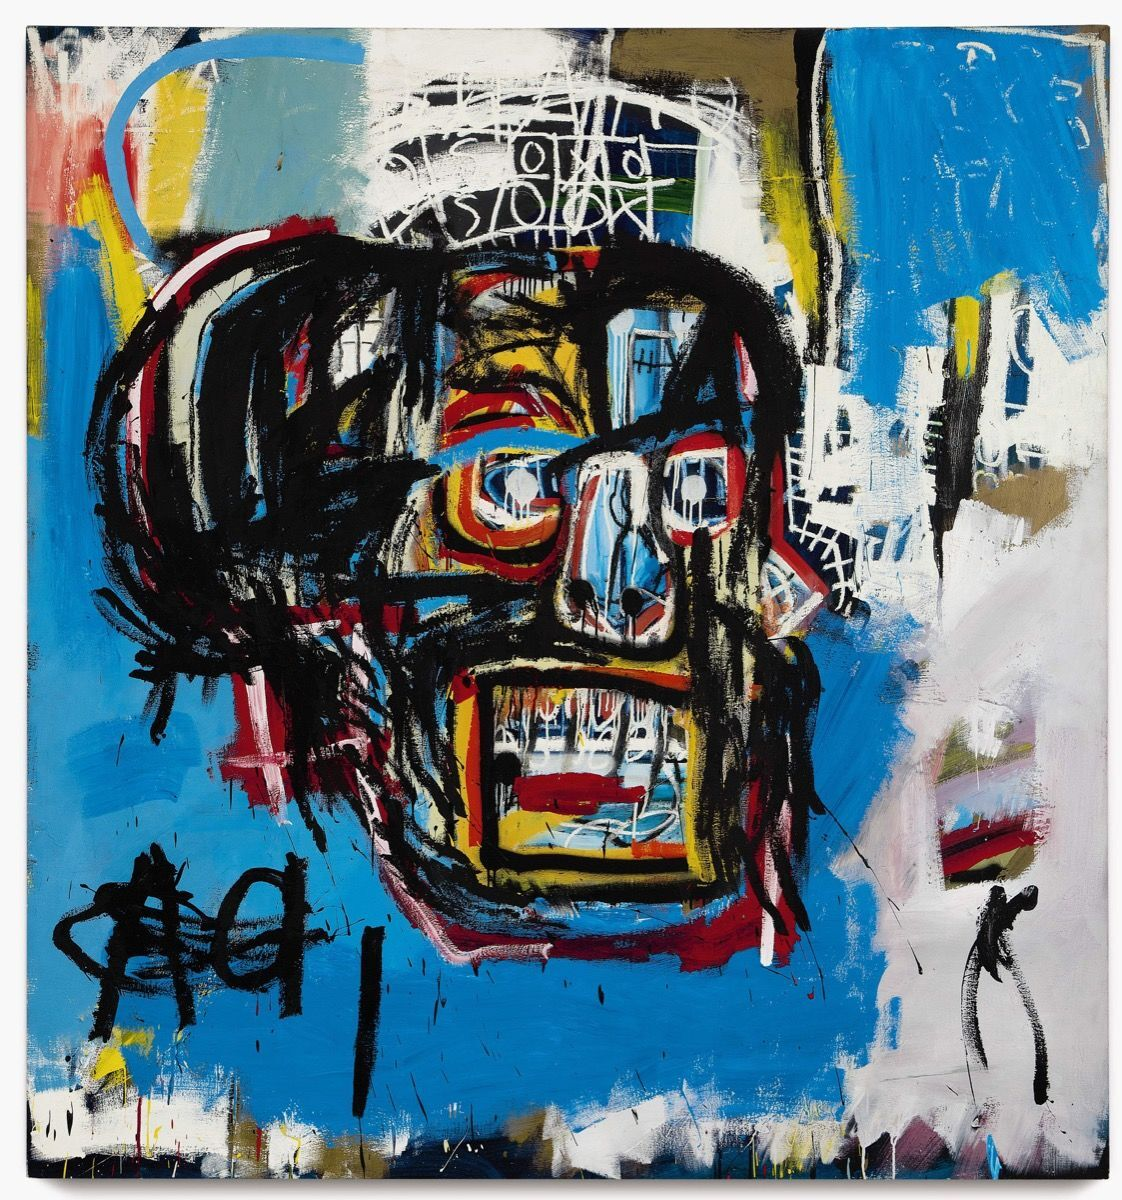 Jean-Michel Basquiat, Untitled, 1982. Per gentile concessione di Sotheby's.